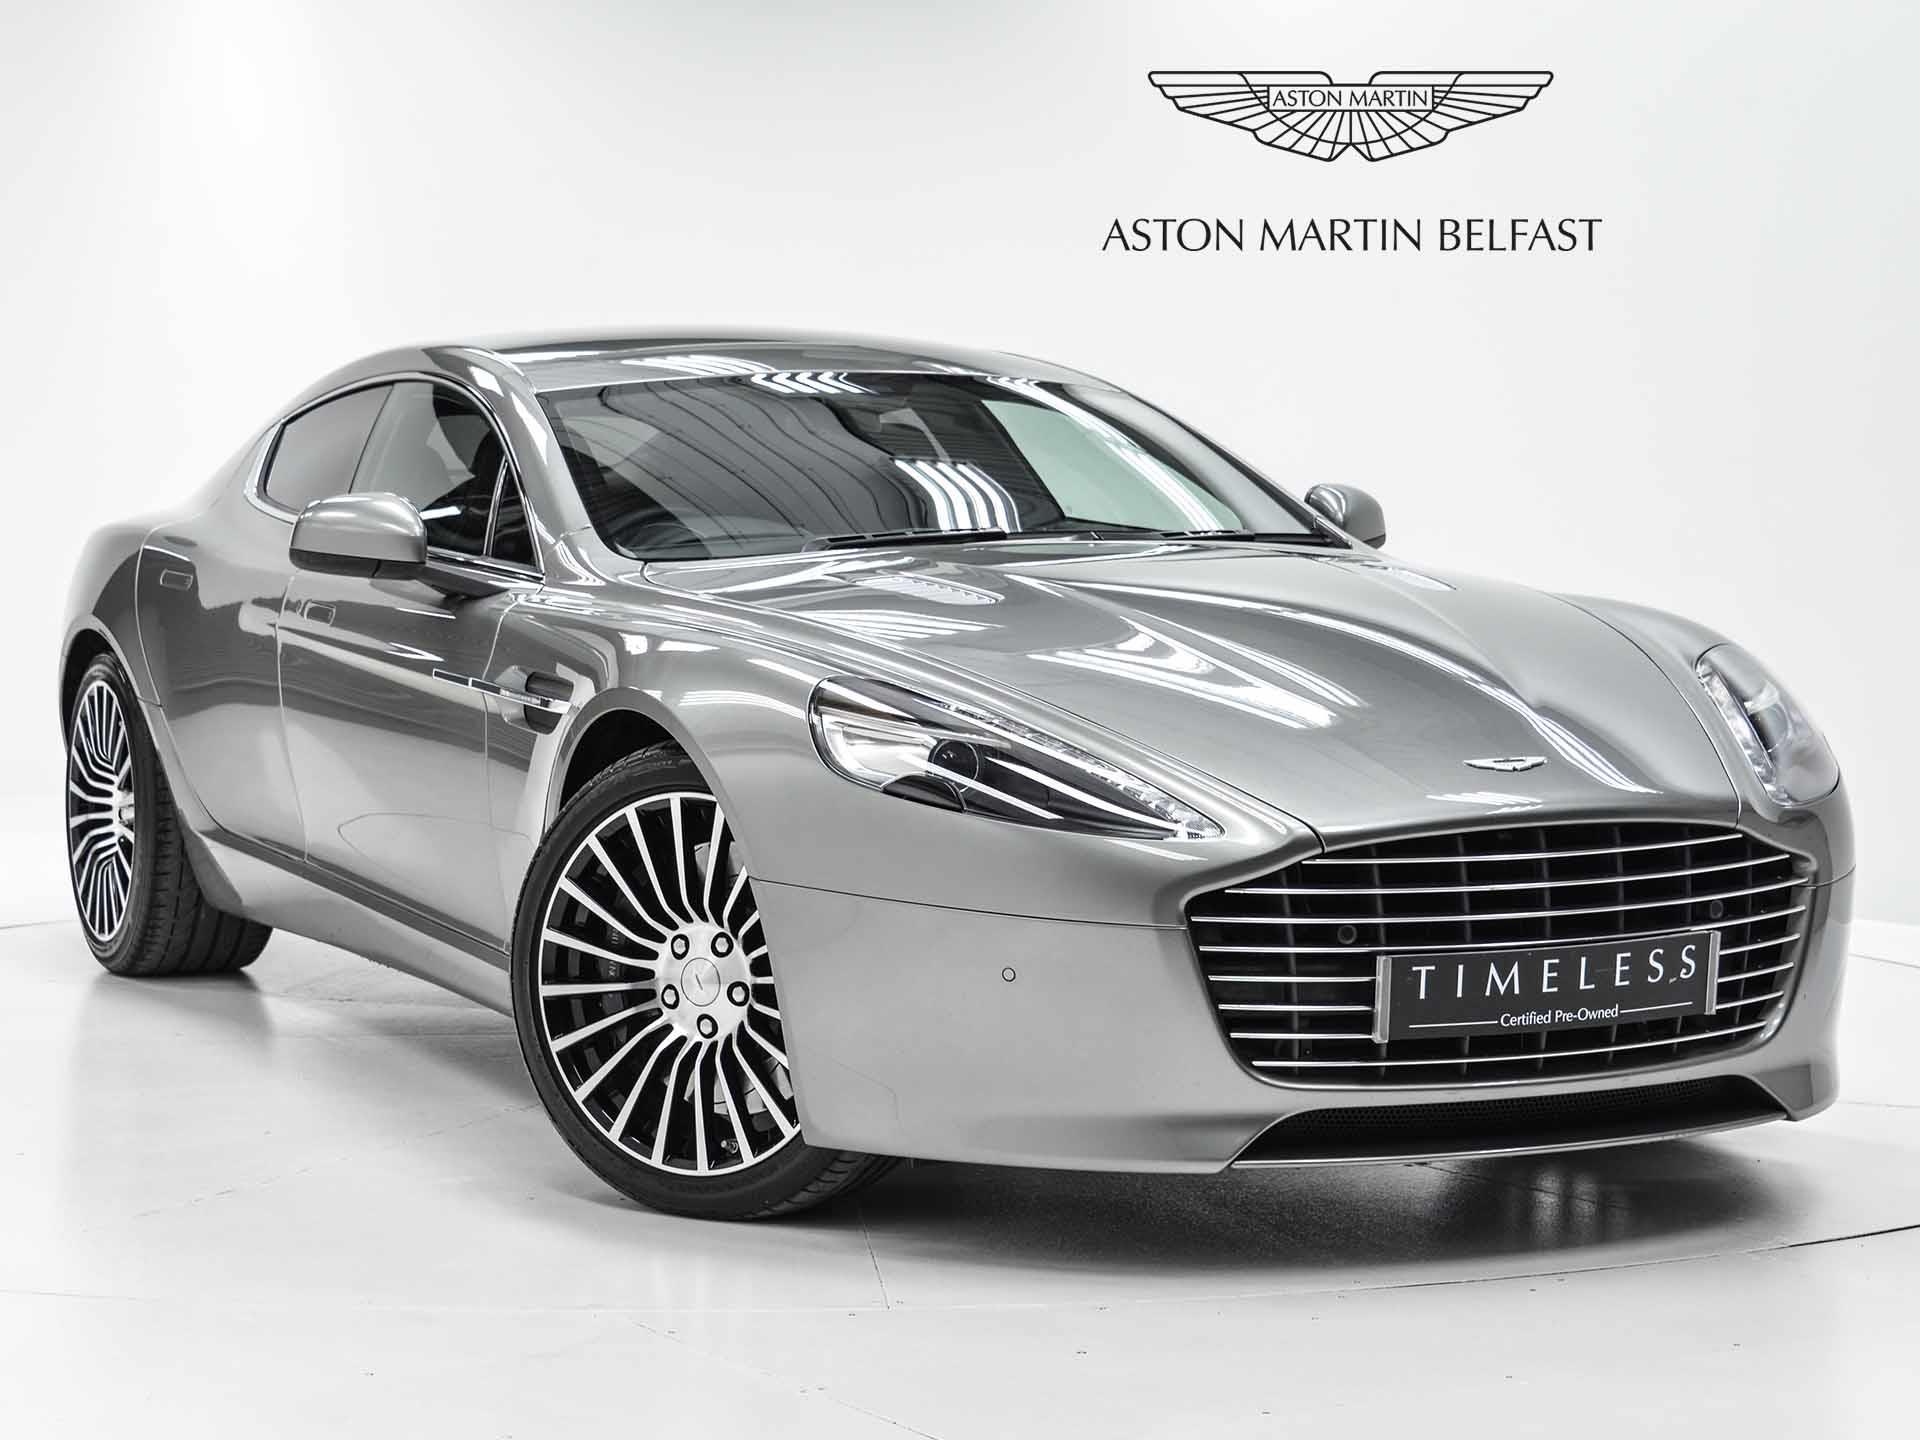 pre-owned | aston martin belfast - official aston martin dealer